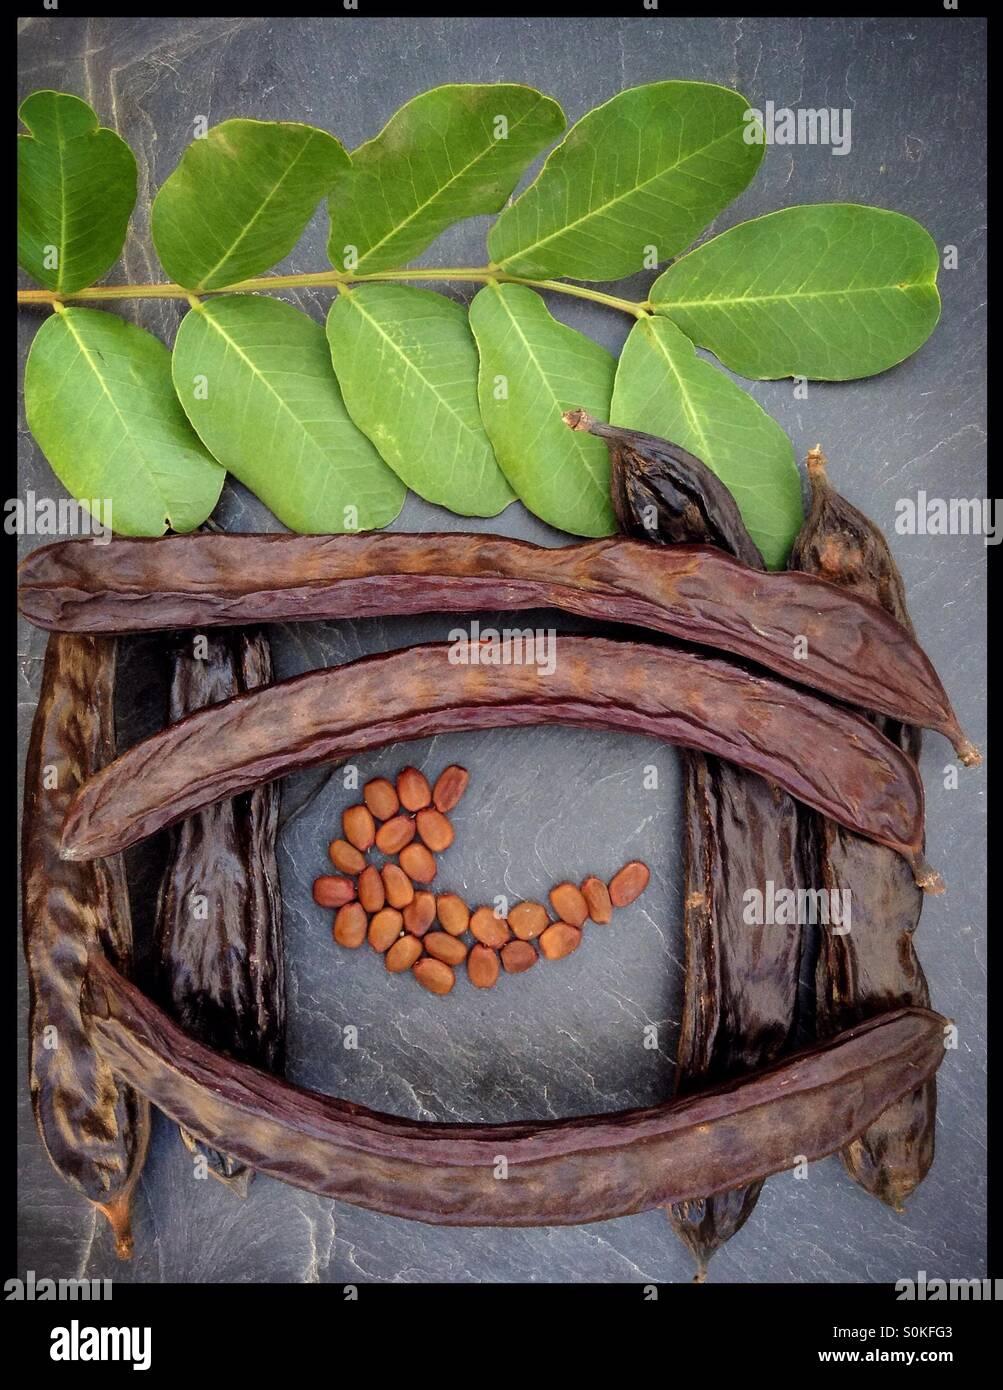 Carob Tree Pods